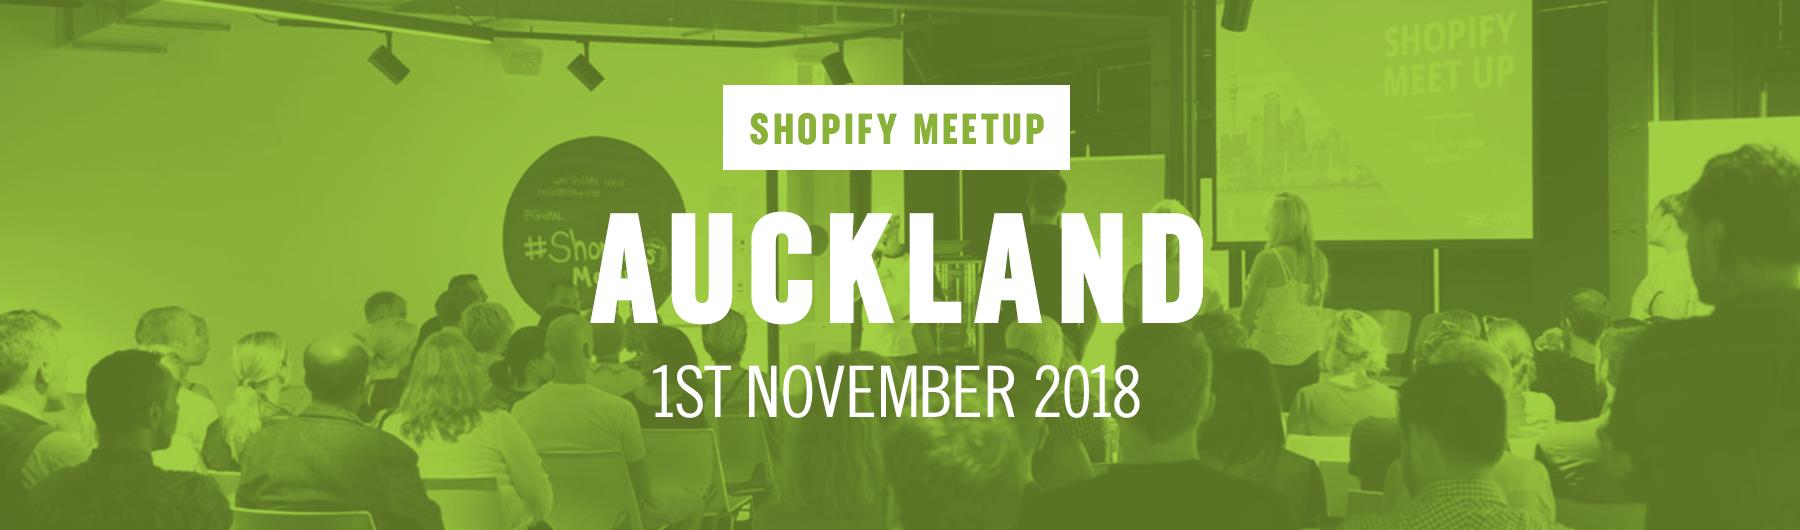 Auckland Shopify Meetup November 2018